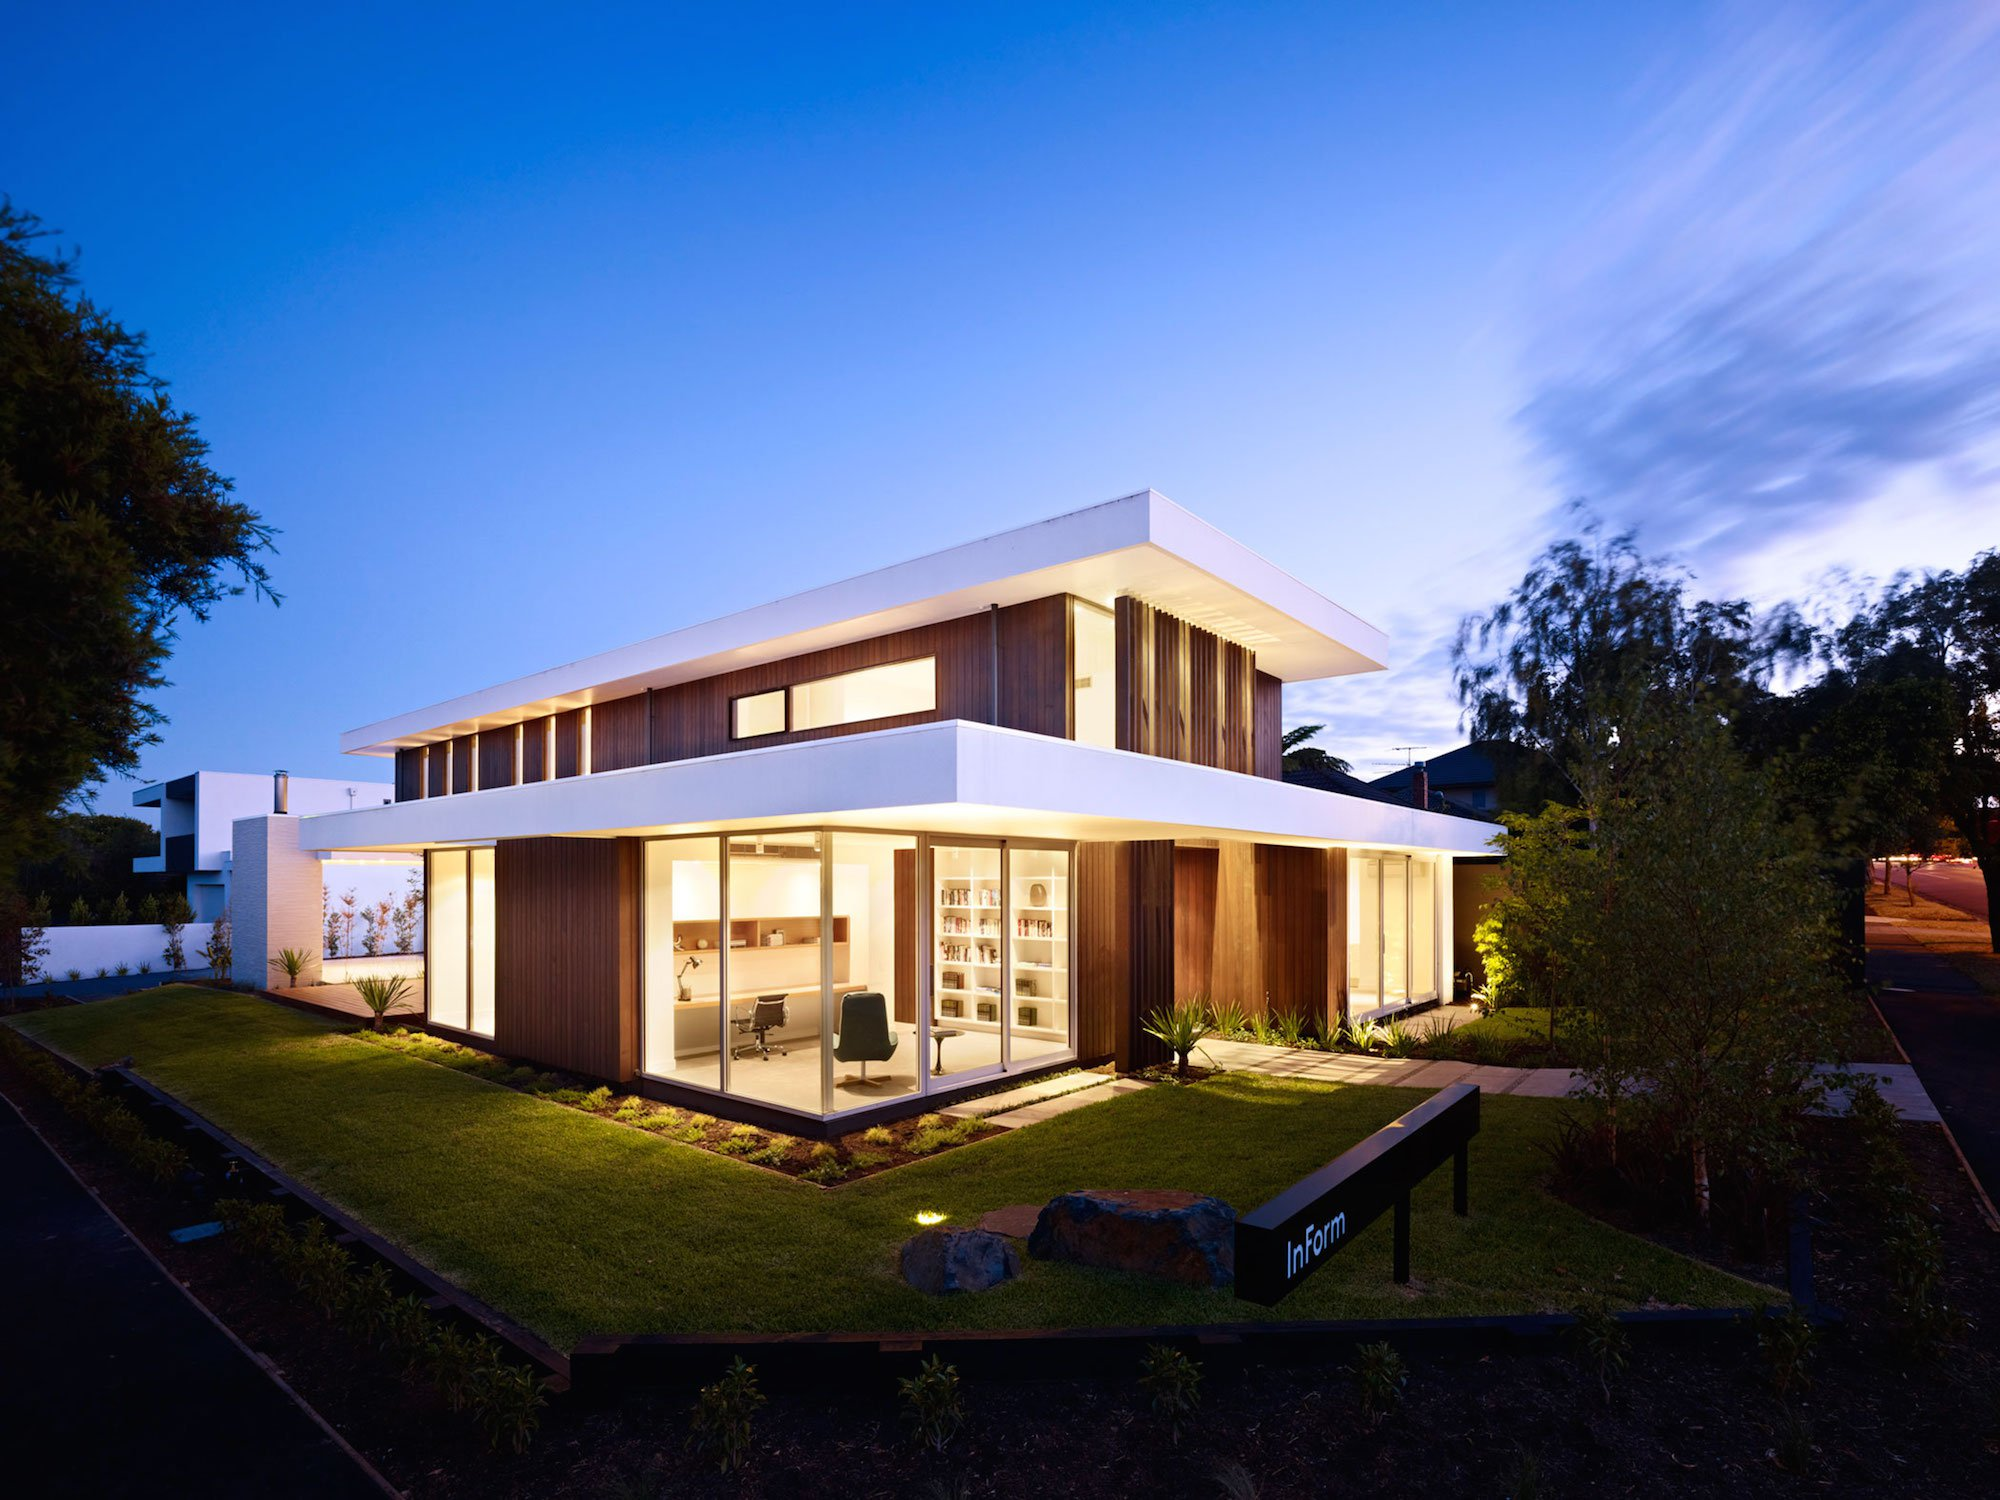 California House By Inform Design Pleysier Perkins Home Design